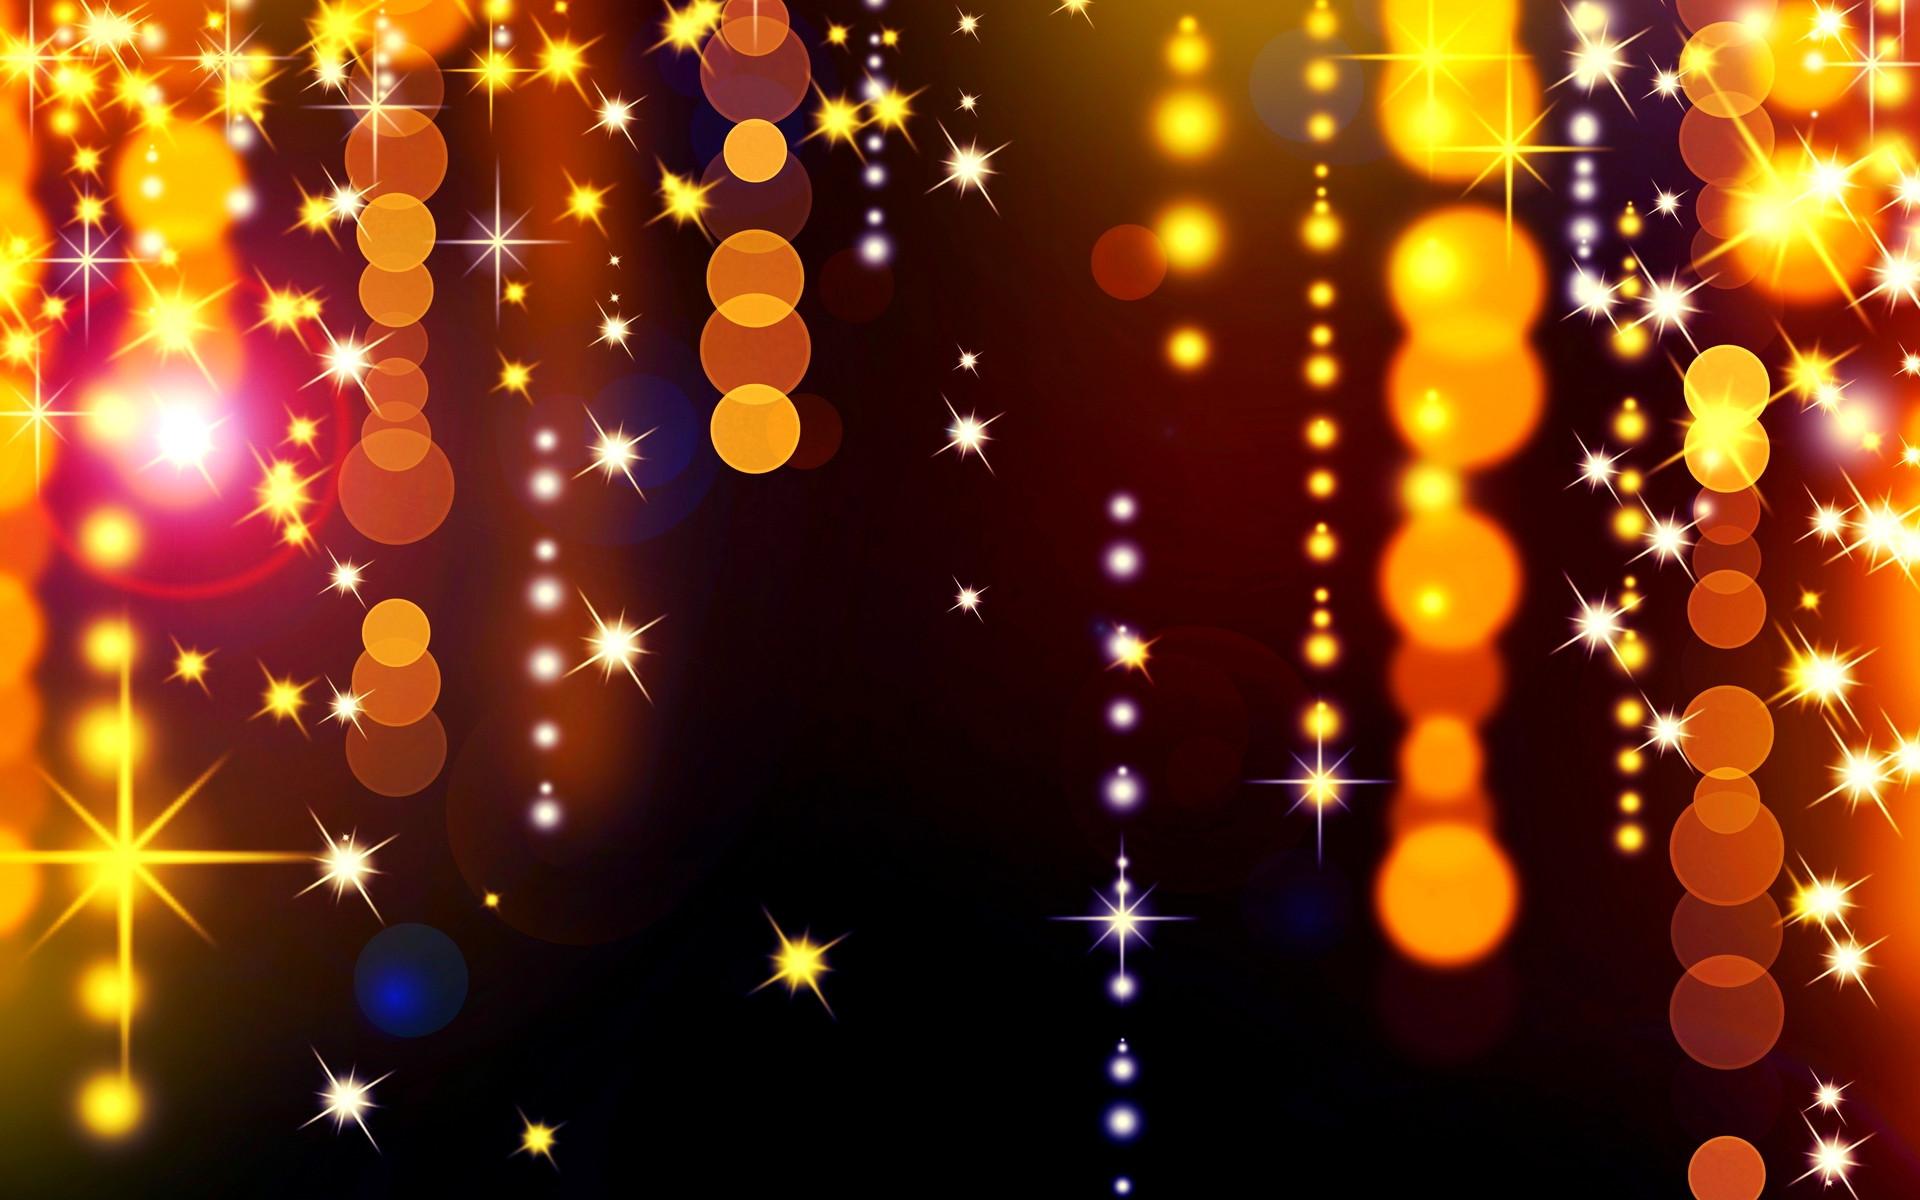 Lights Wallpaper HD